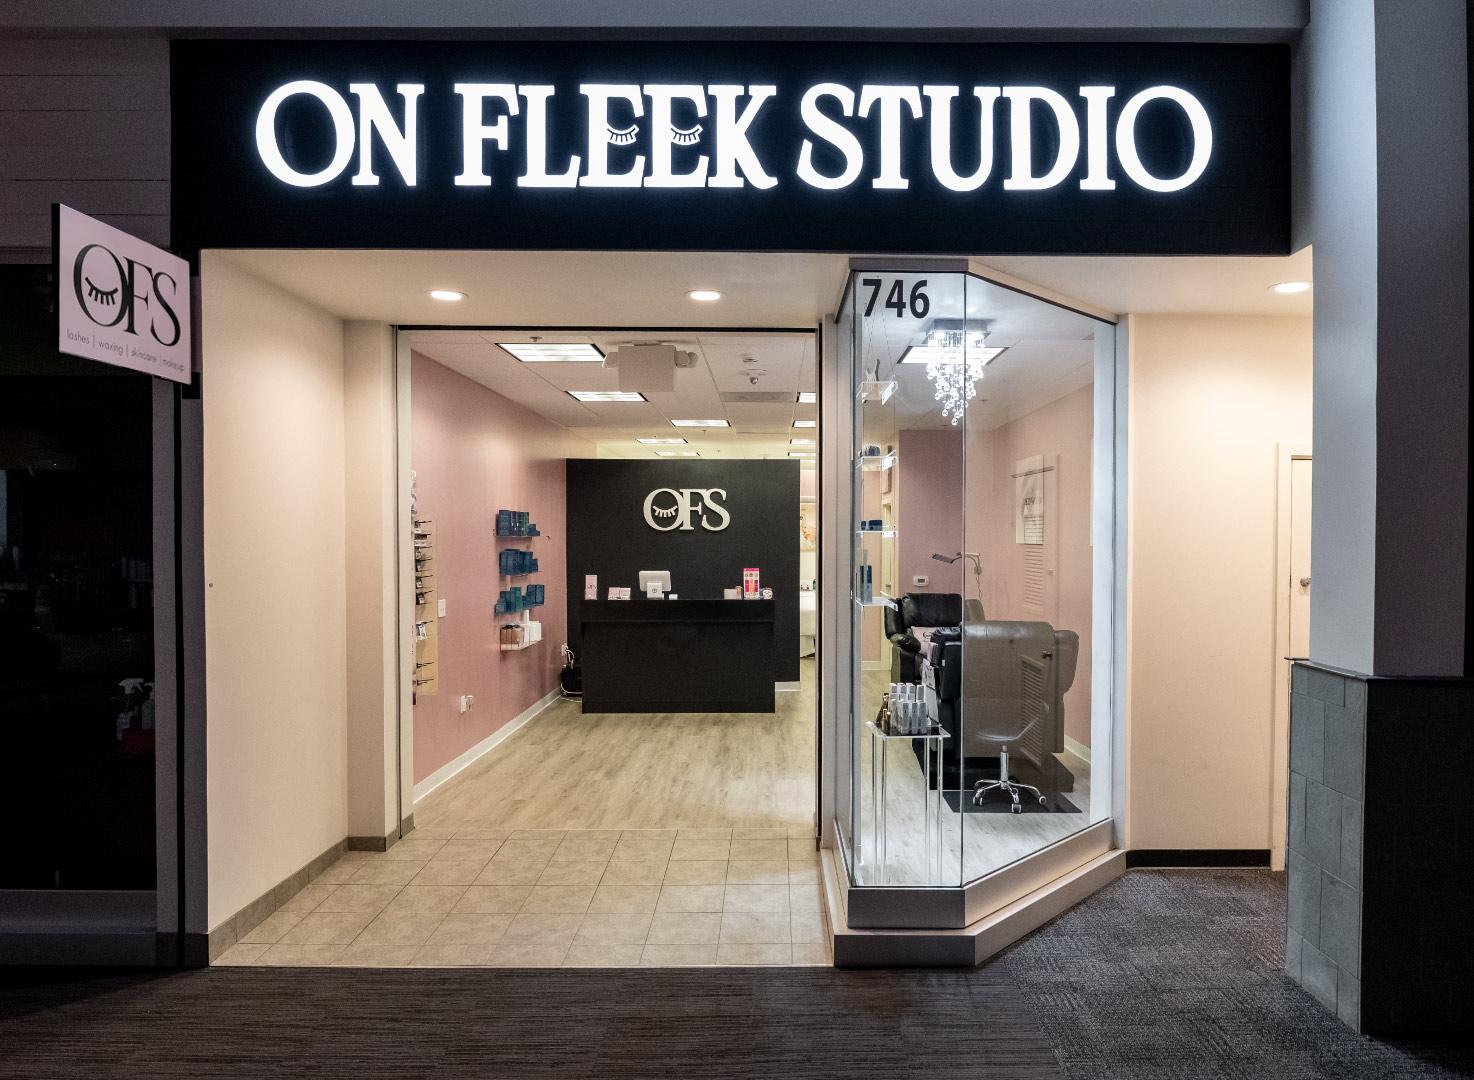 On Fleek Studio inside Santa Rosa's Coddingtown Mall